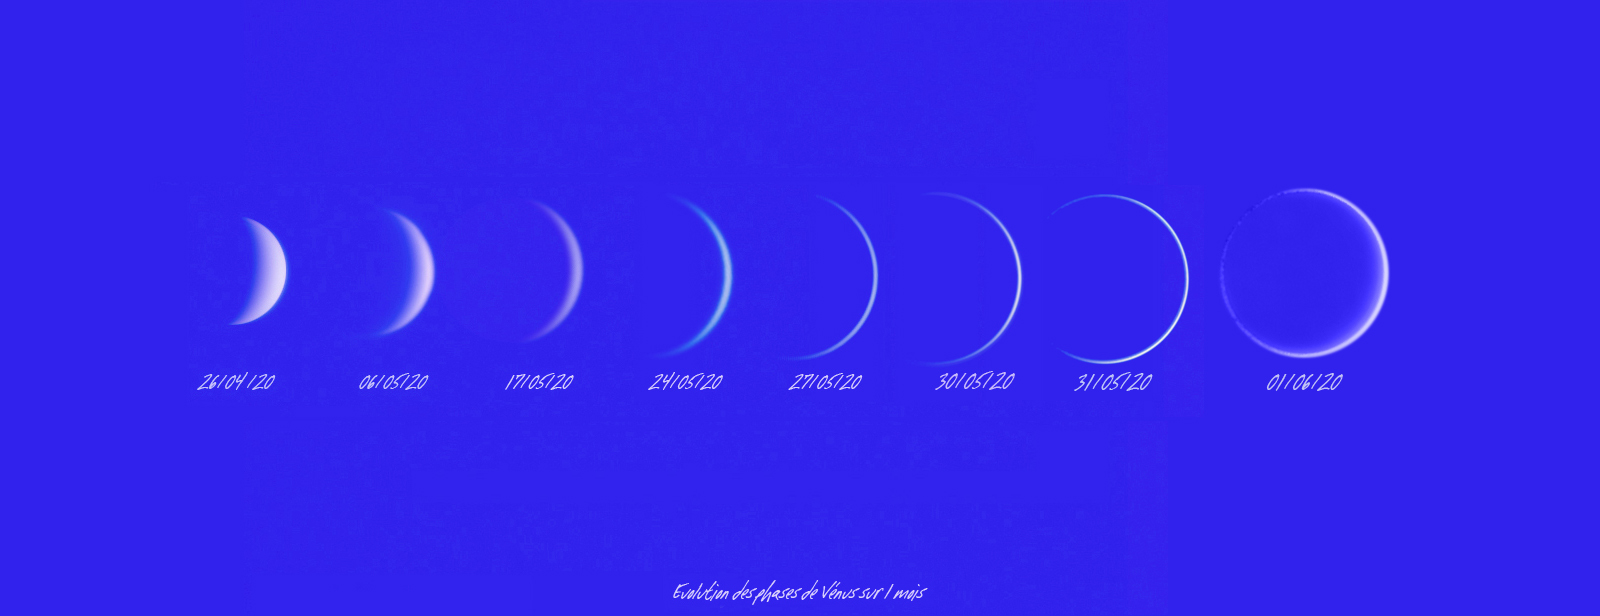 26 avril - 1er juin 2020 - Venus